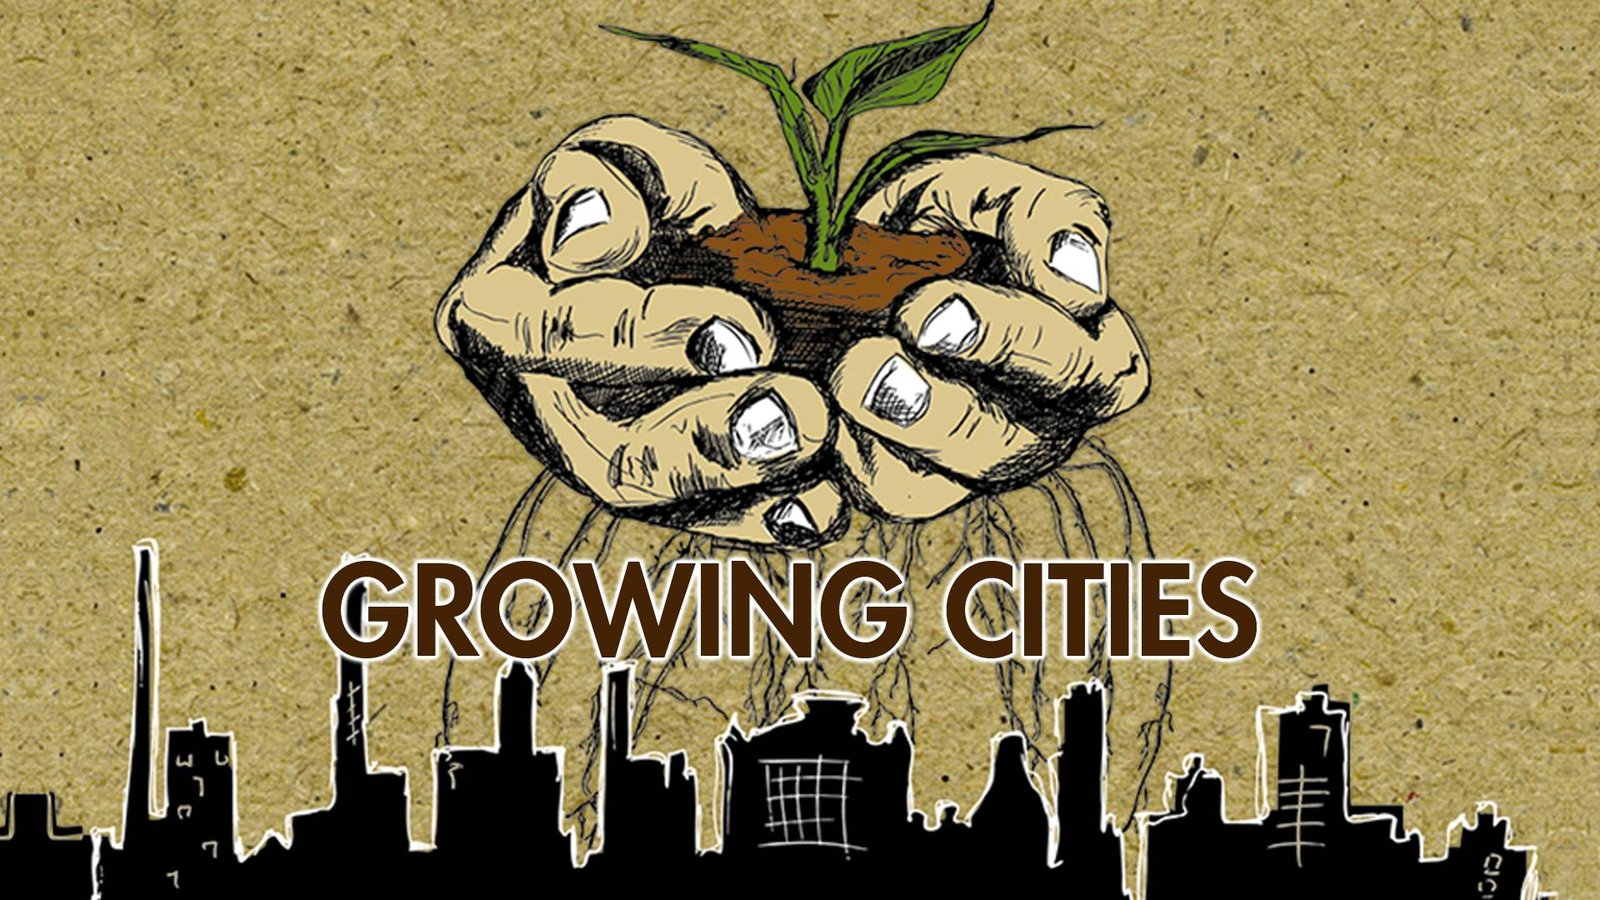 Growing Cities - Urban Farming in America